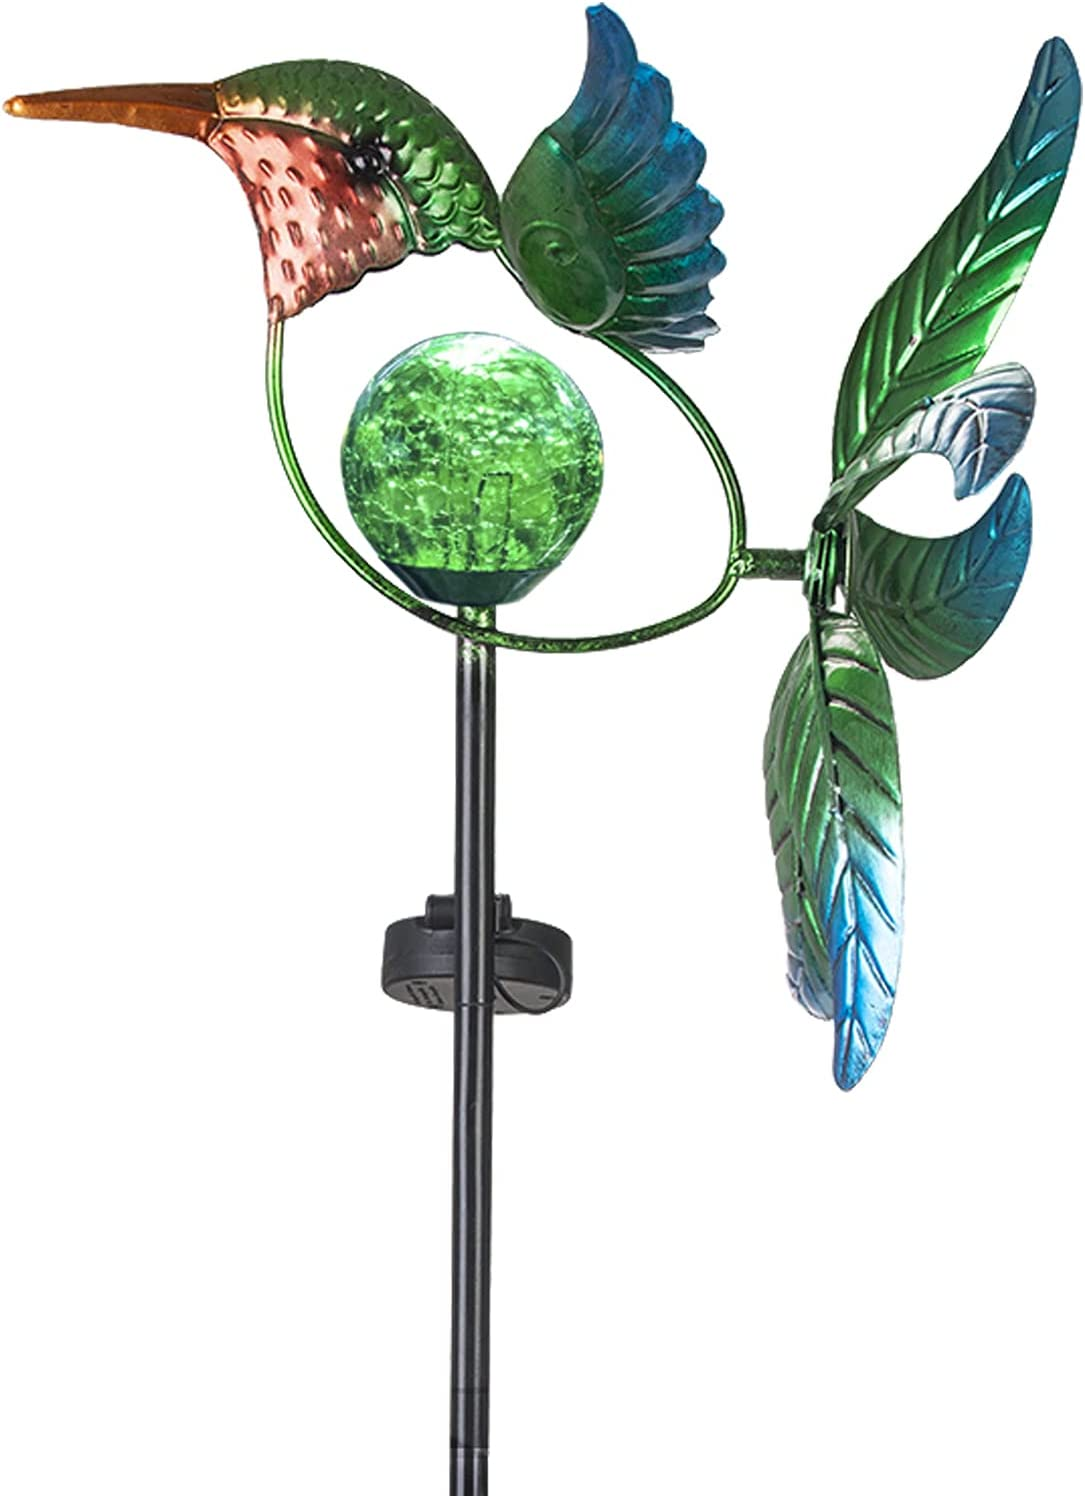 VEWOGARDEN Solar Wind Max 63% OFF Spinner Decorations Yard Max 51% OFF Hummingbird Art